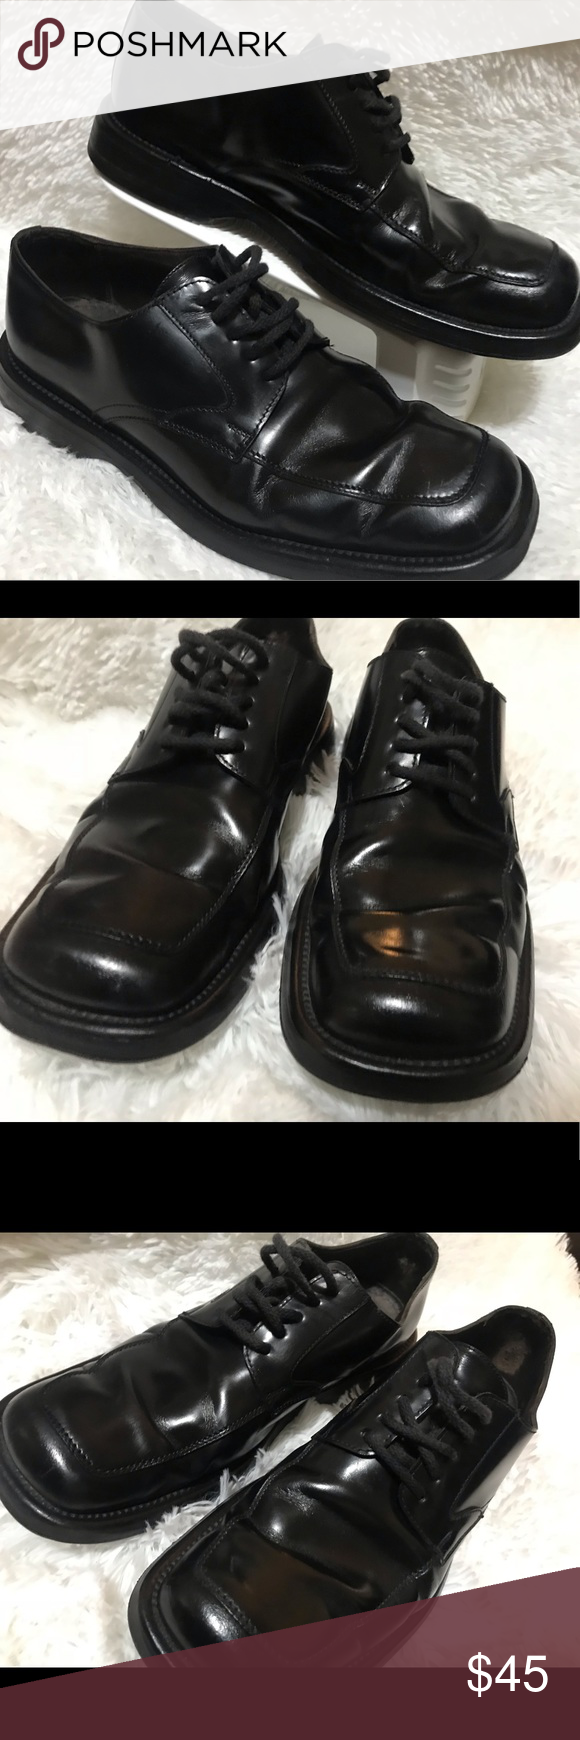 Men's Guess 7.5 Black Leather Shoes